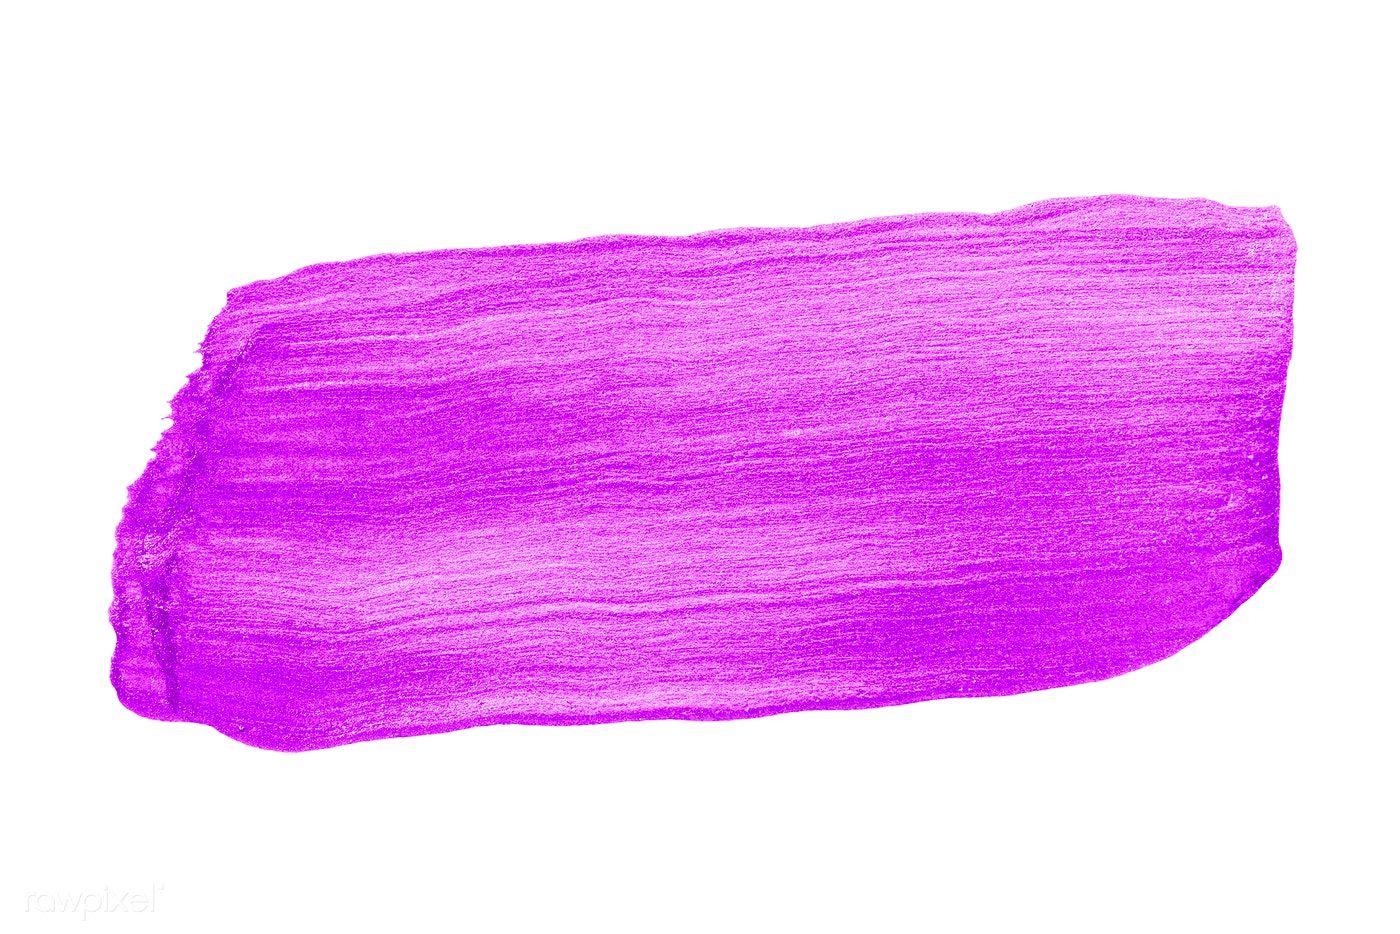 Festive Shimmery Purple Brush Stroke Free Image By Rawpixel Com Ake In 2021 Pink Brushes Brush Strokes Brush Stroke Png